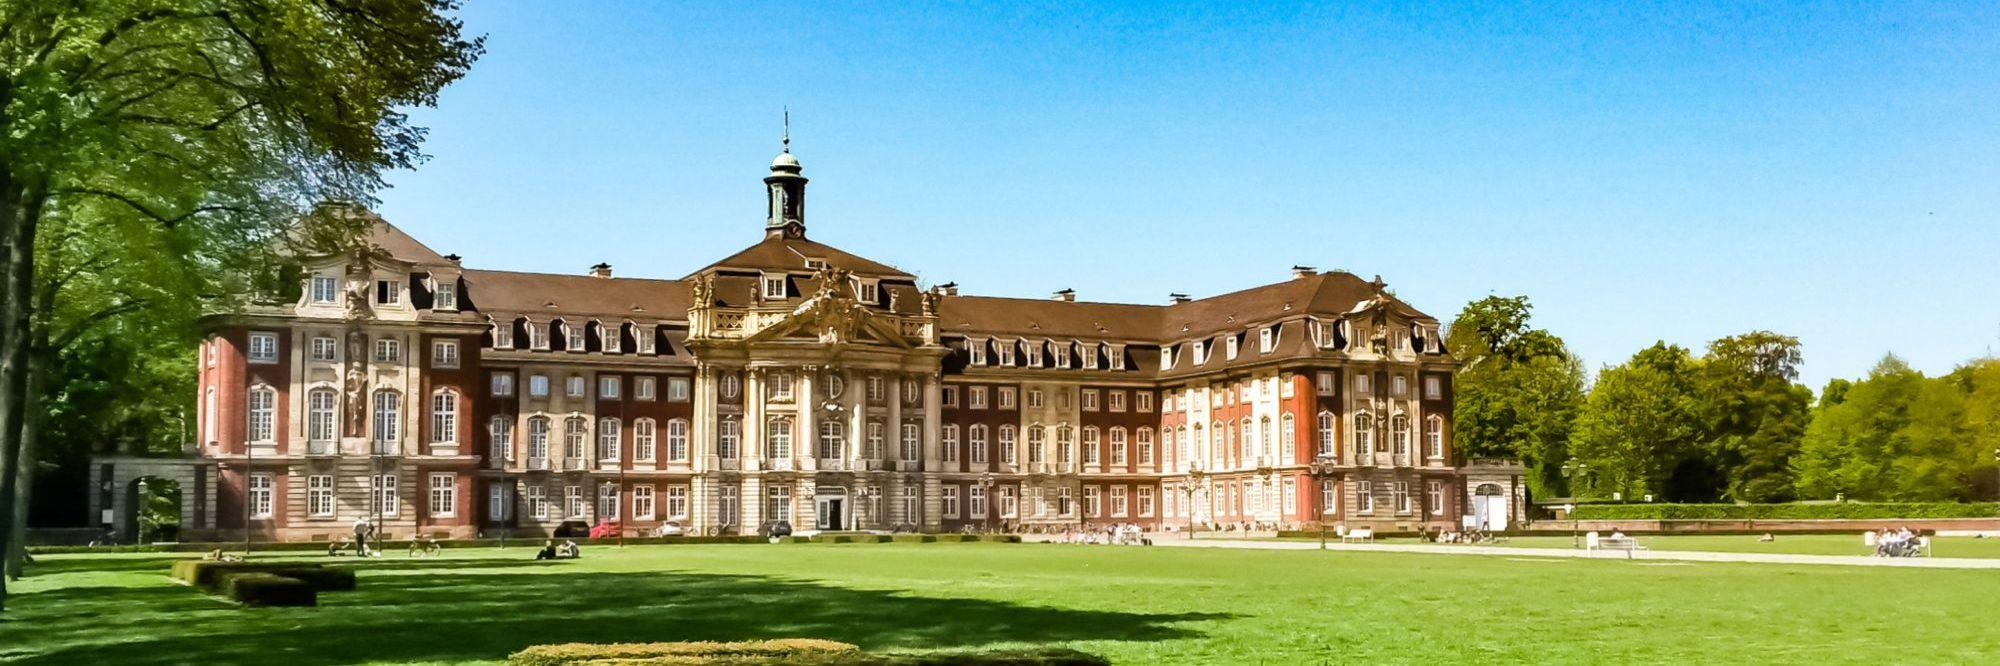 headerfoto kastelenroute Münster Schloss